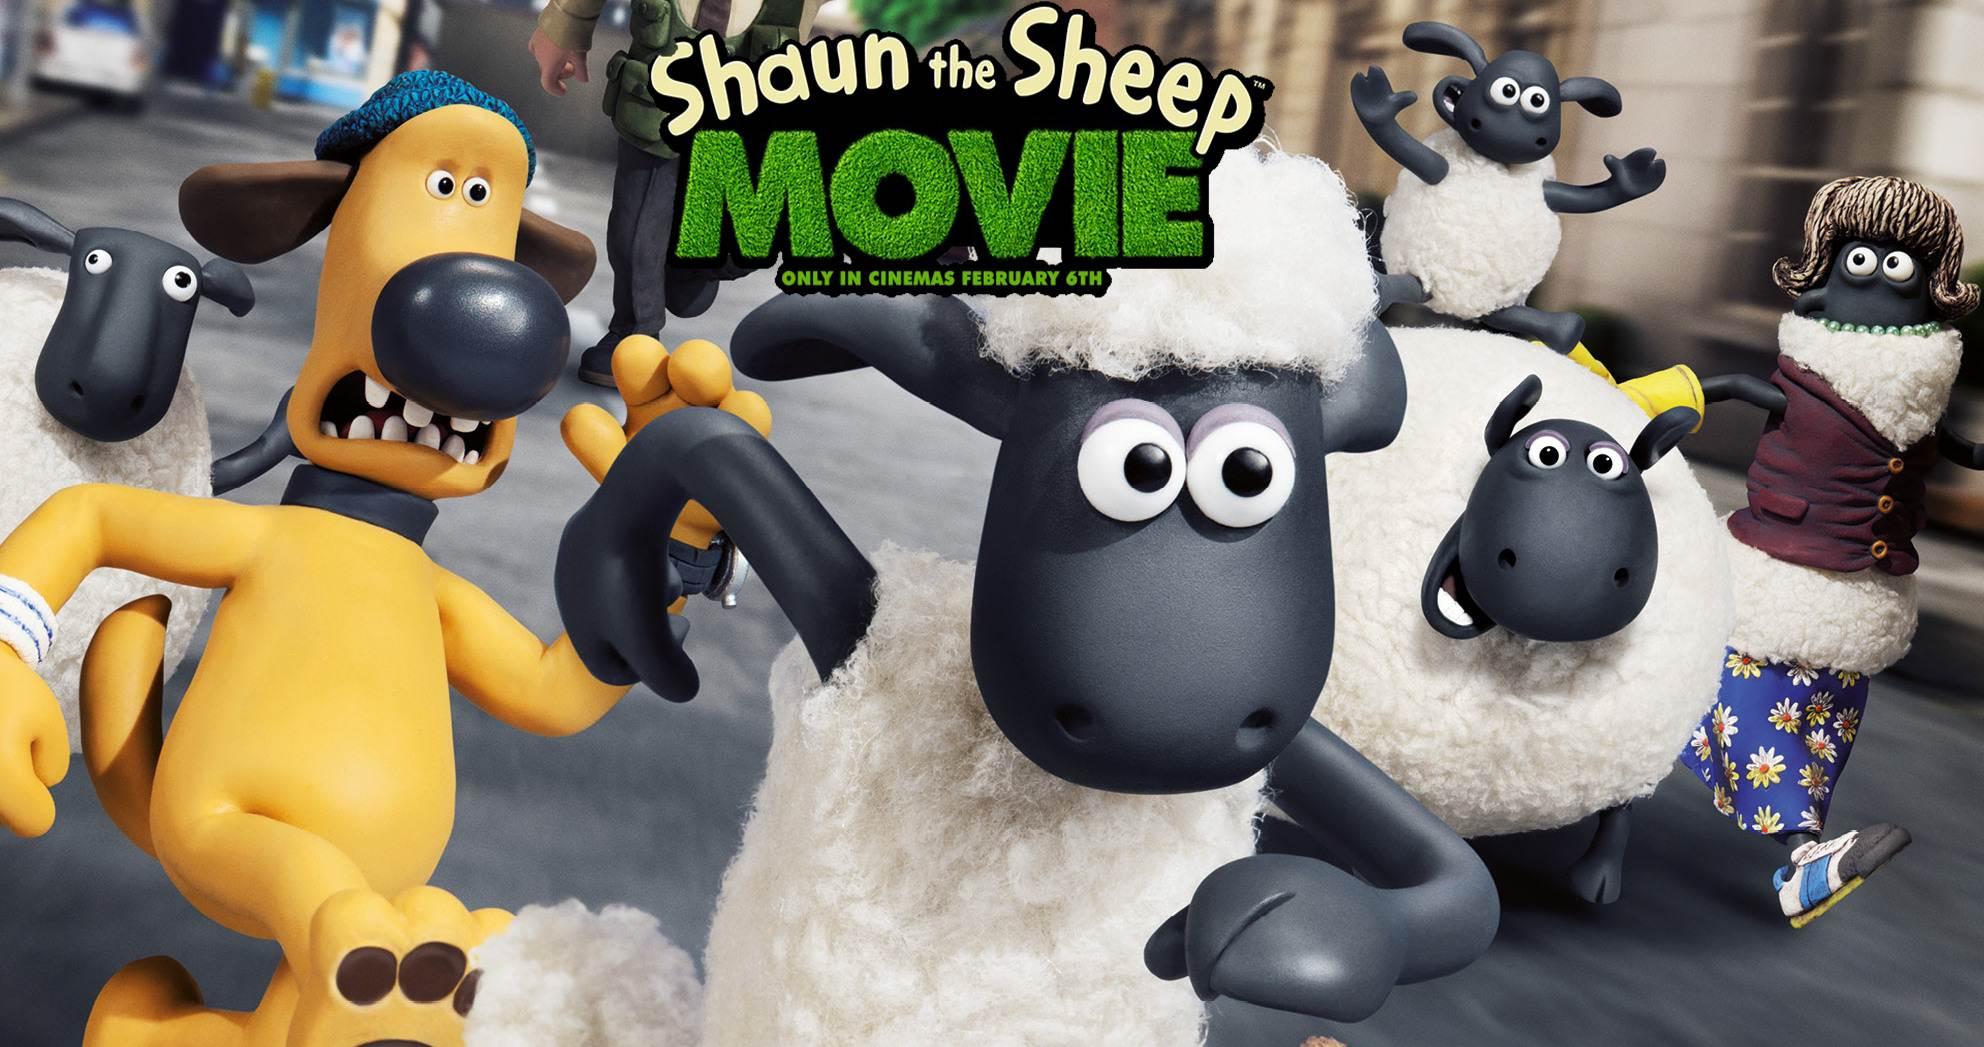 Shaun the Sheep Movie  Shaun the Sheep Wiki  FANDOM